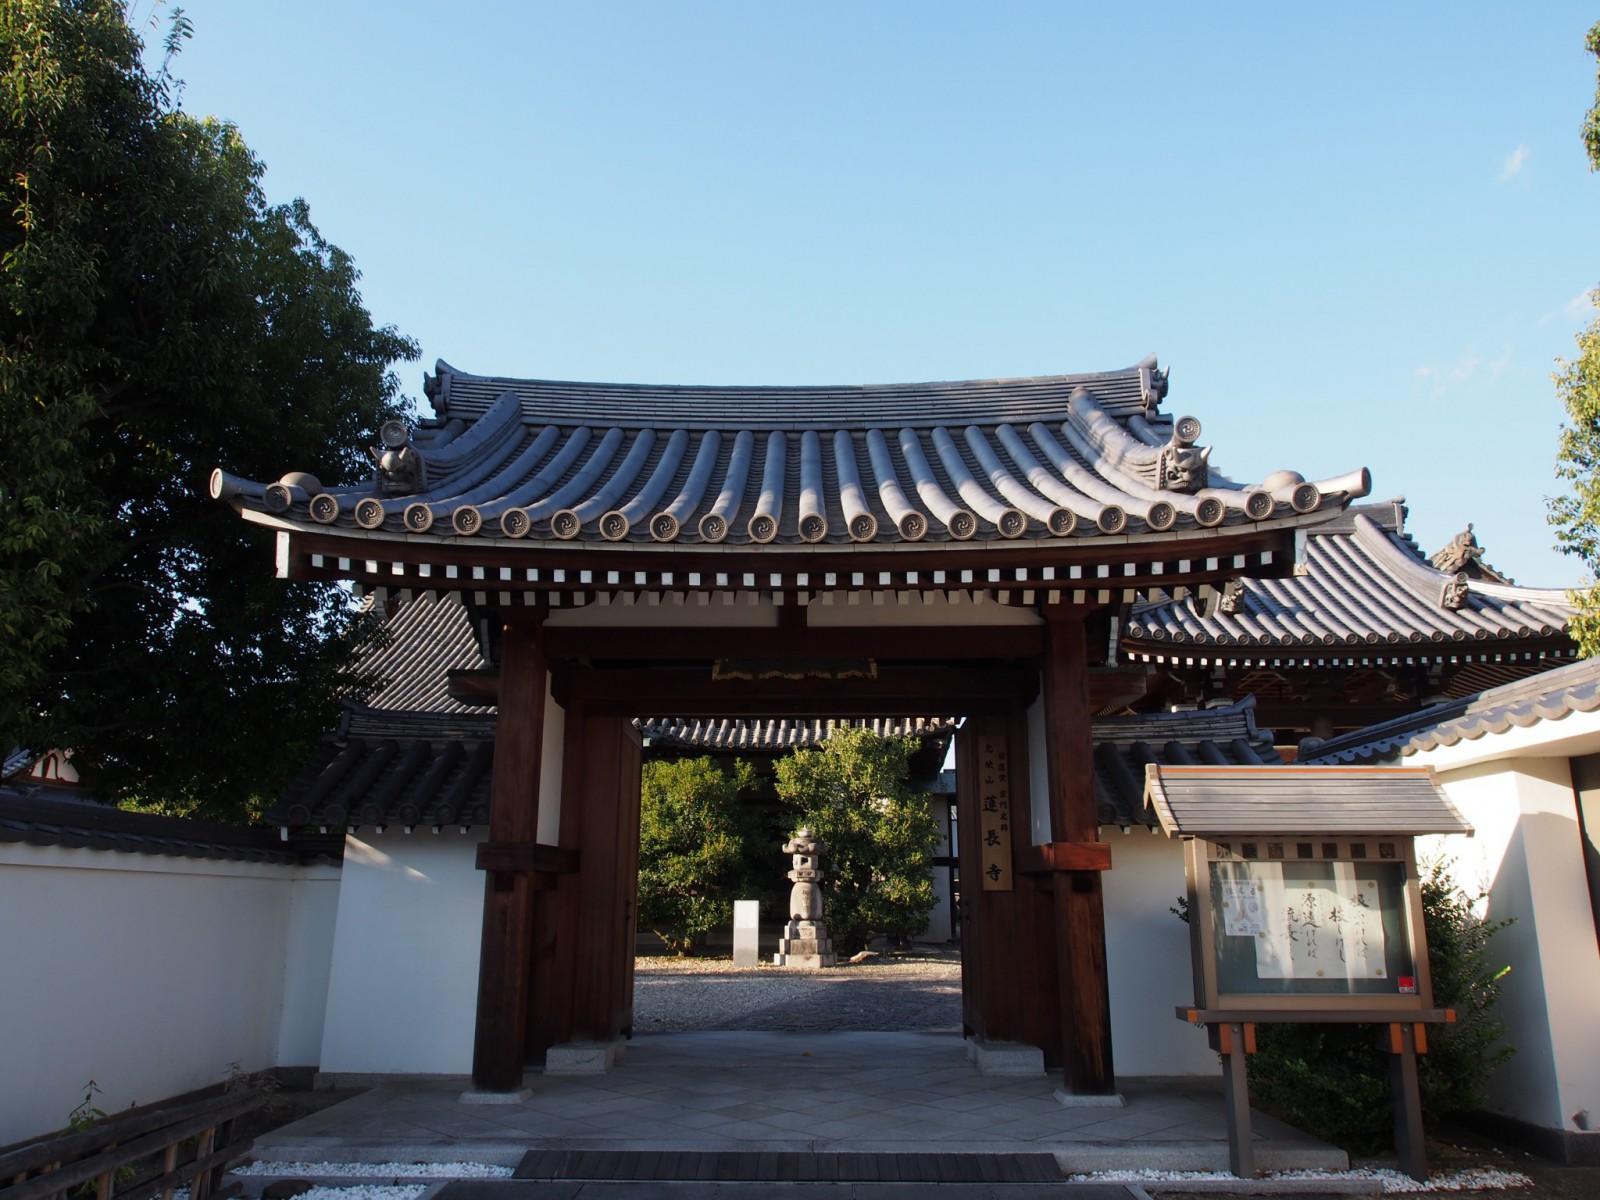 蓮長寺(奈良市)の山門